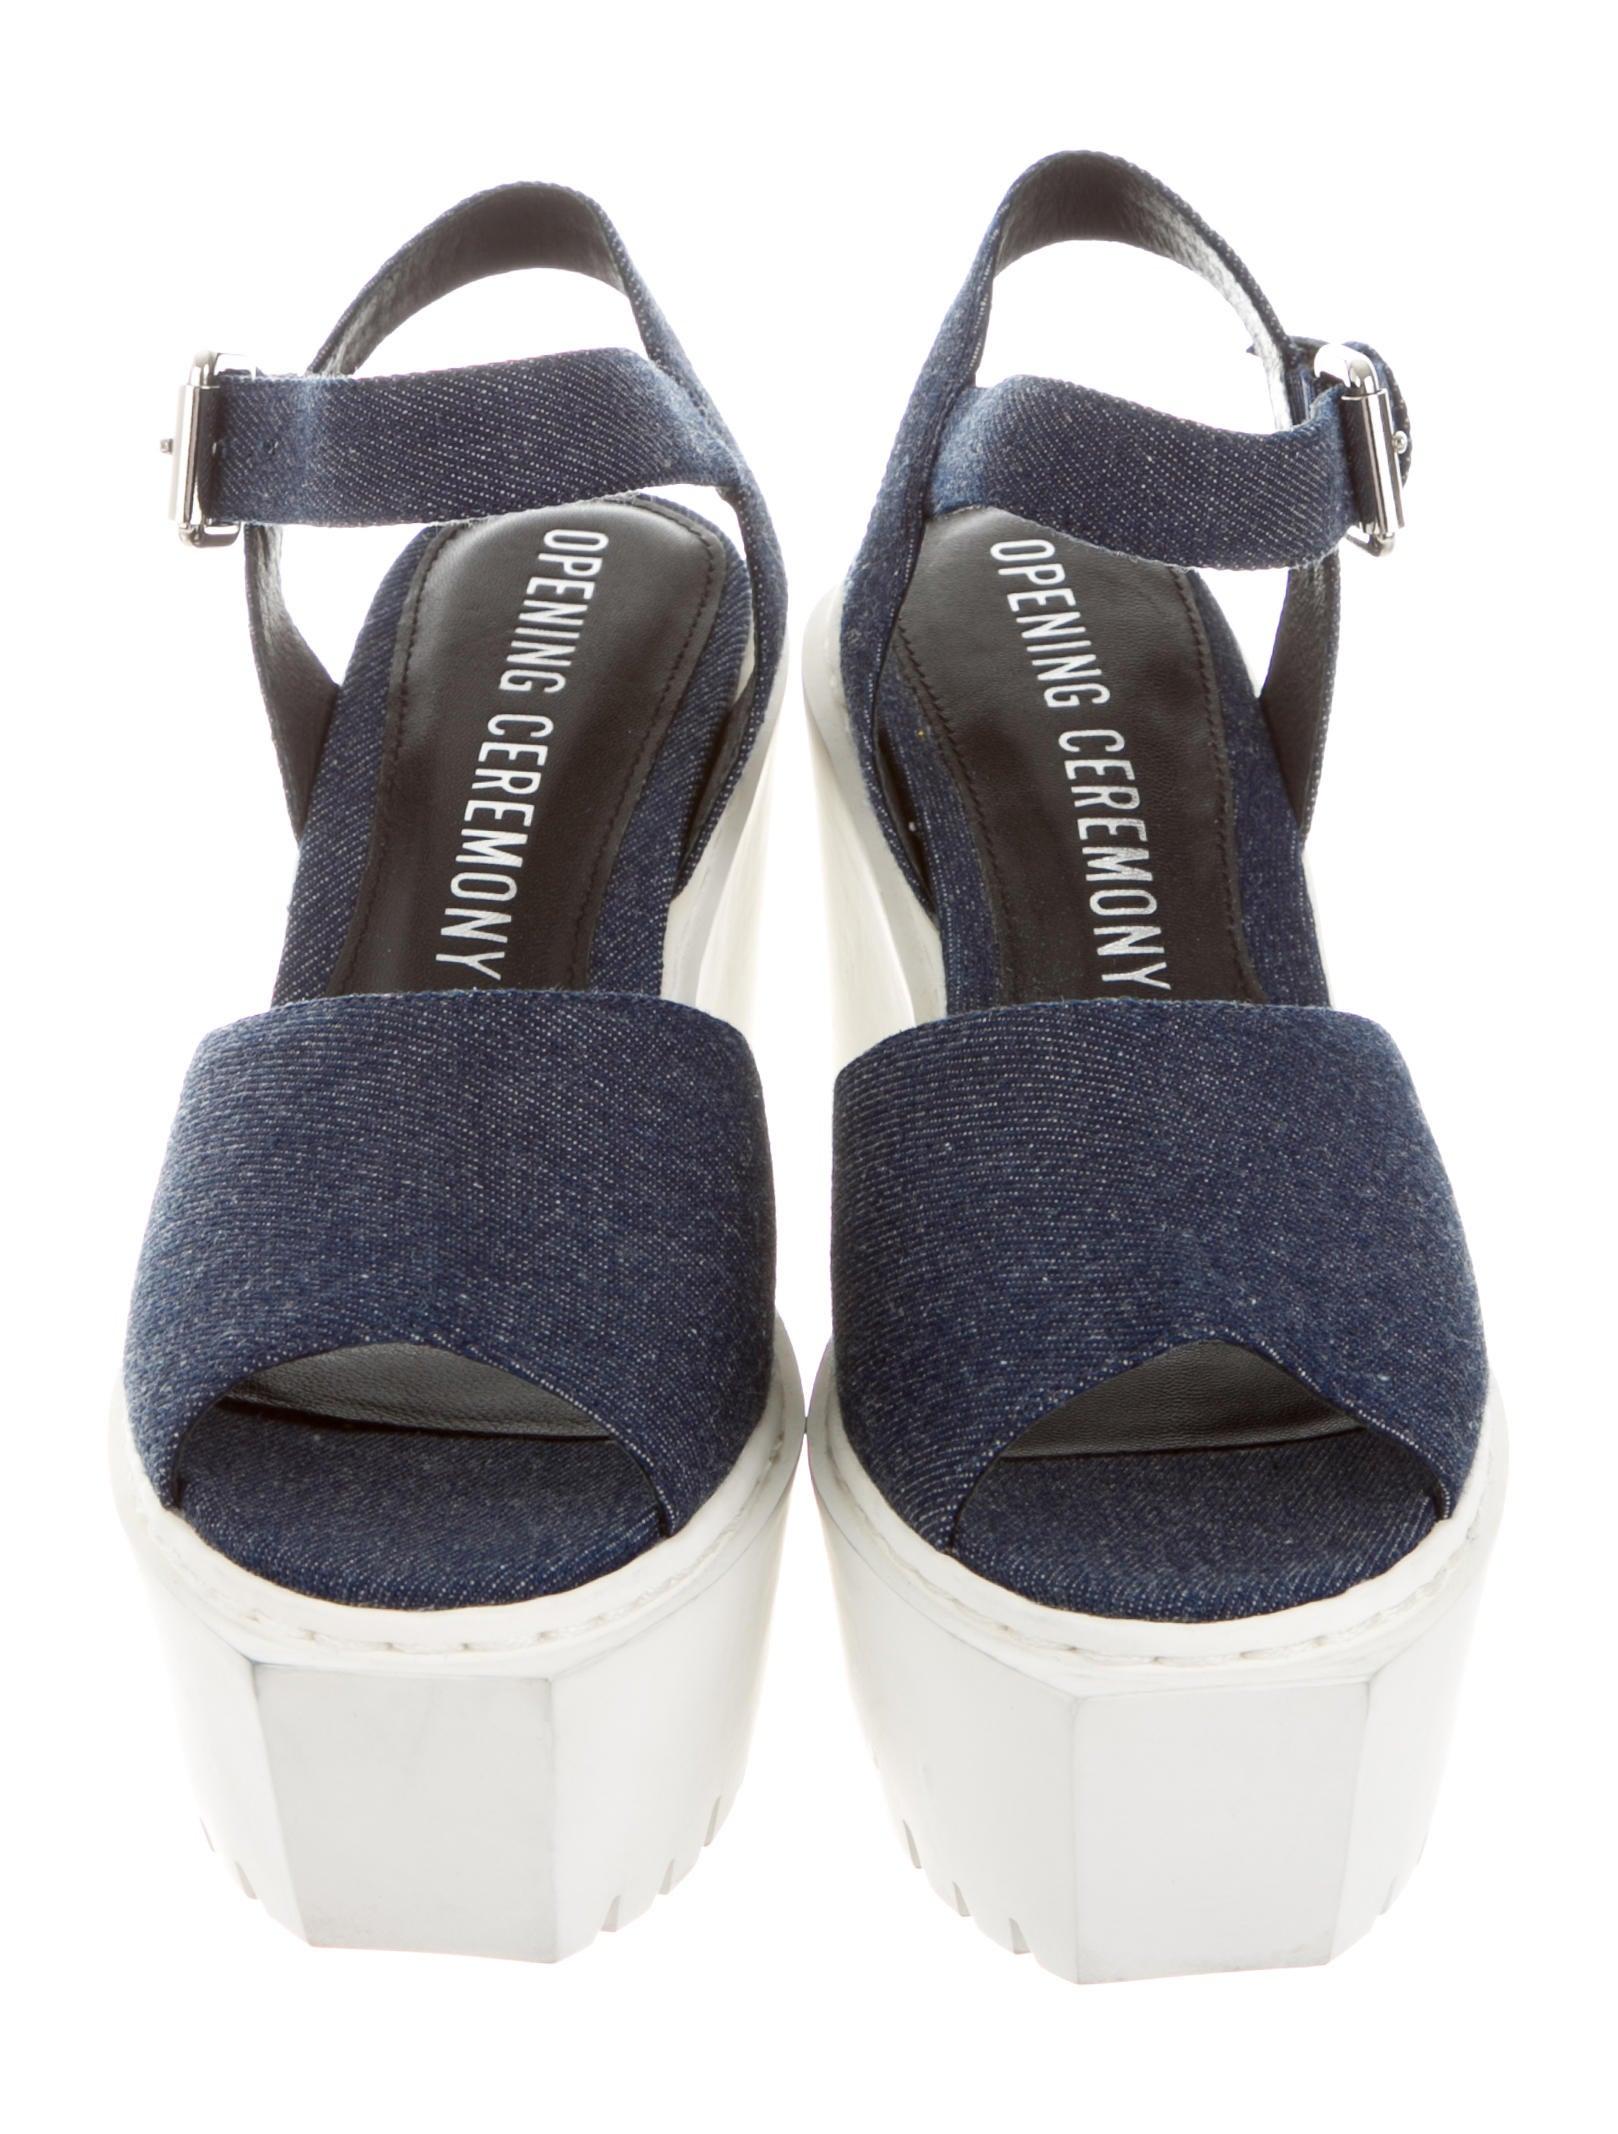 opening ceremony denim platform sandals shoes woc23104